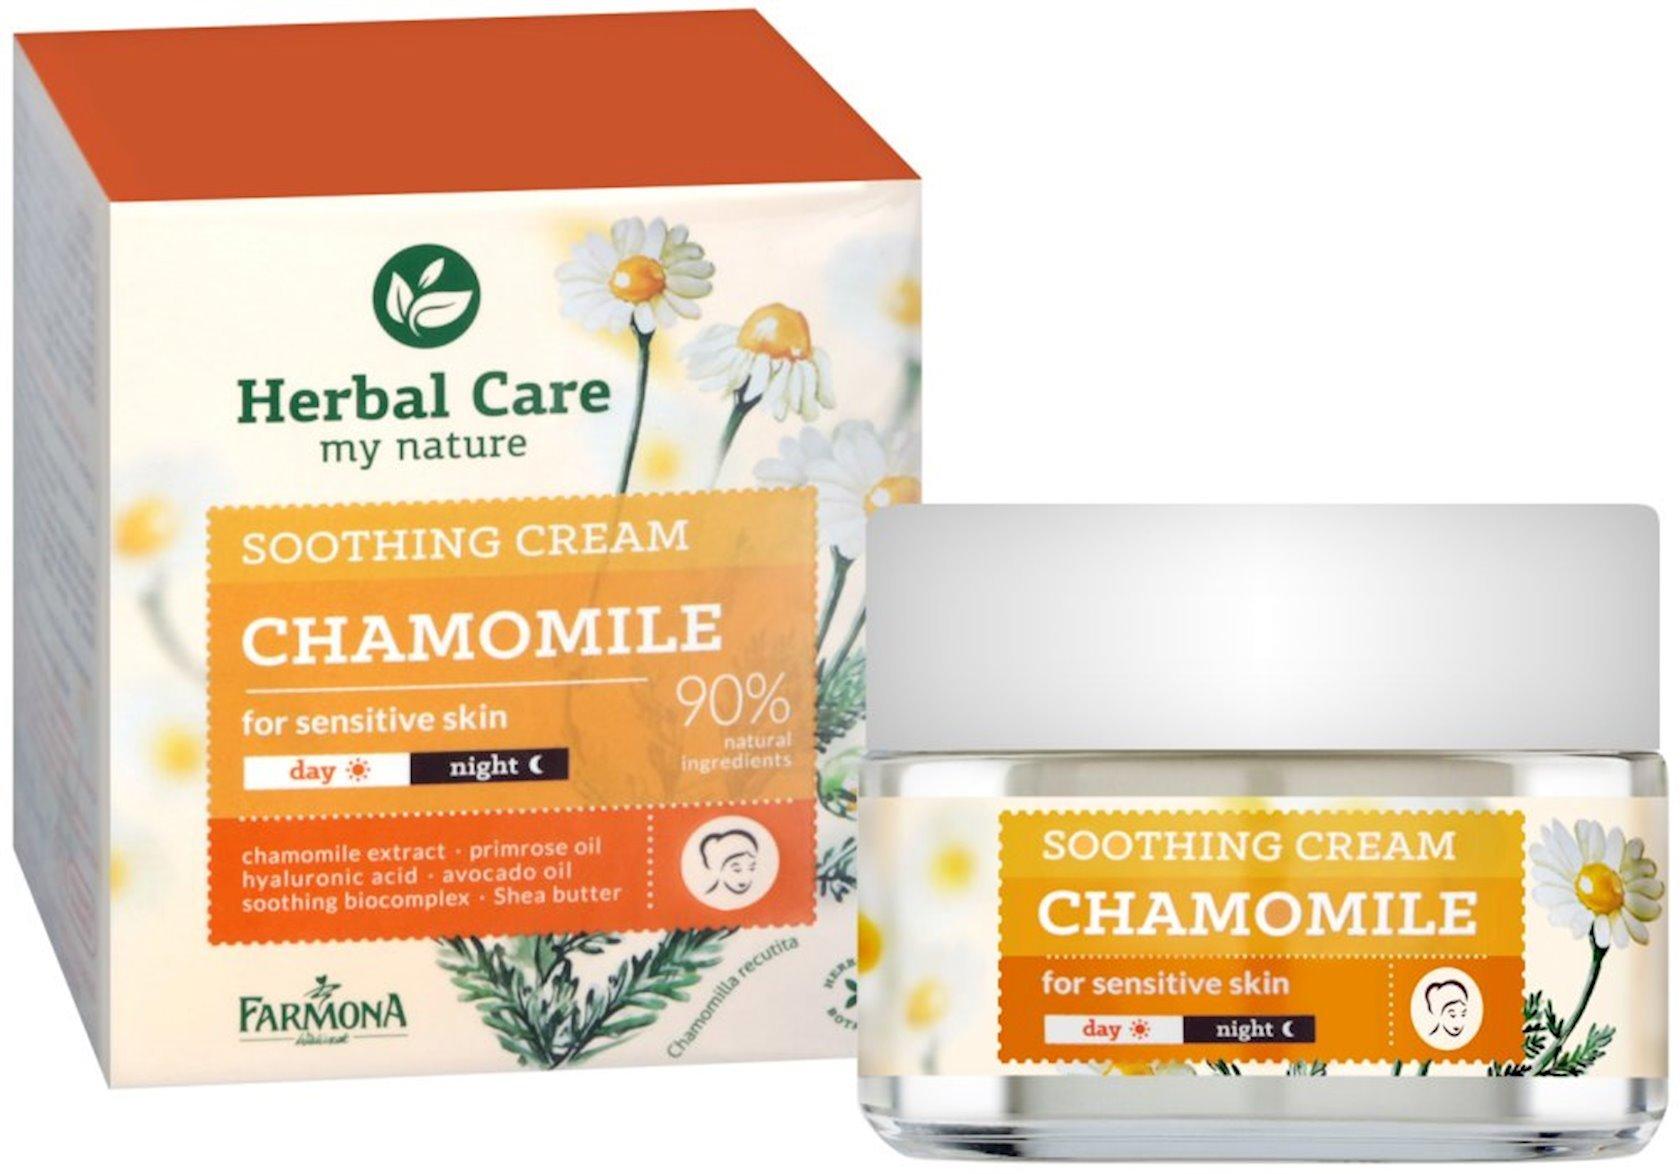 Sakitləşdirici krem üz üçün  Farmona Herbal Care Çobanyastığı